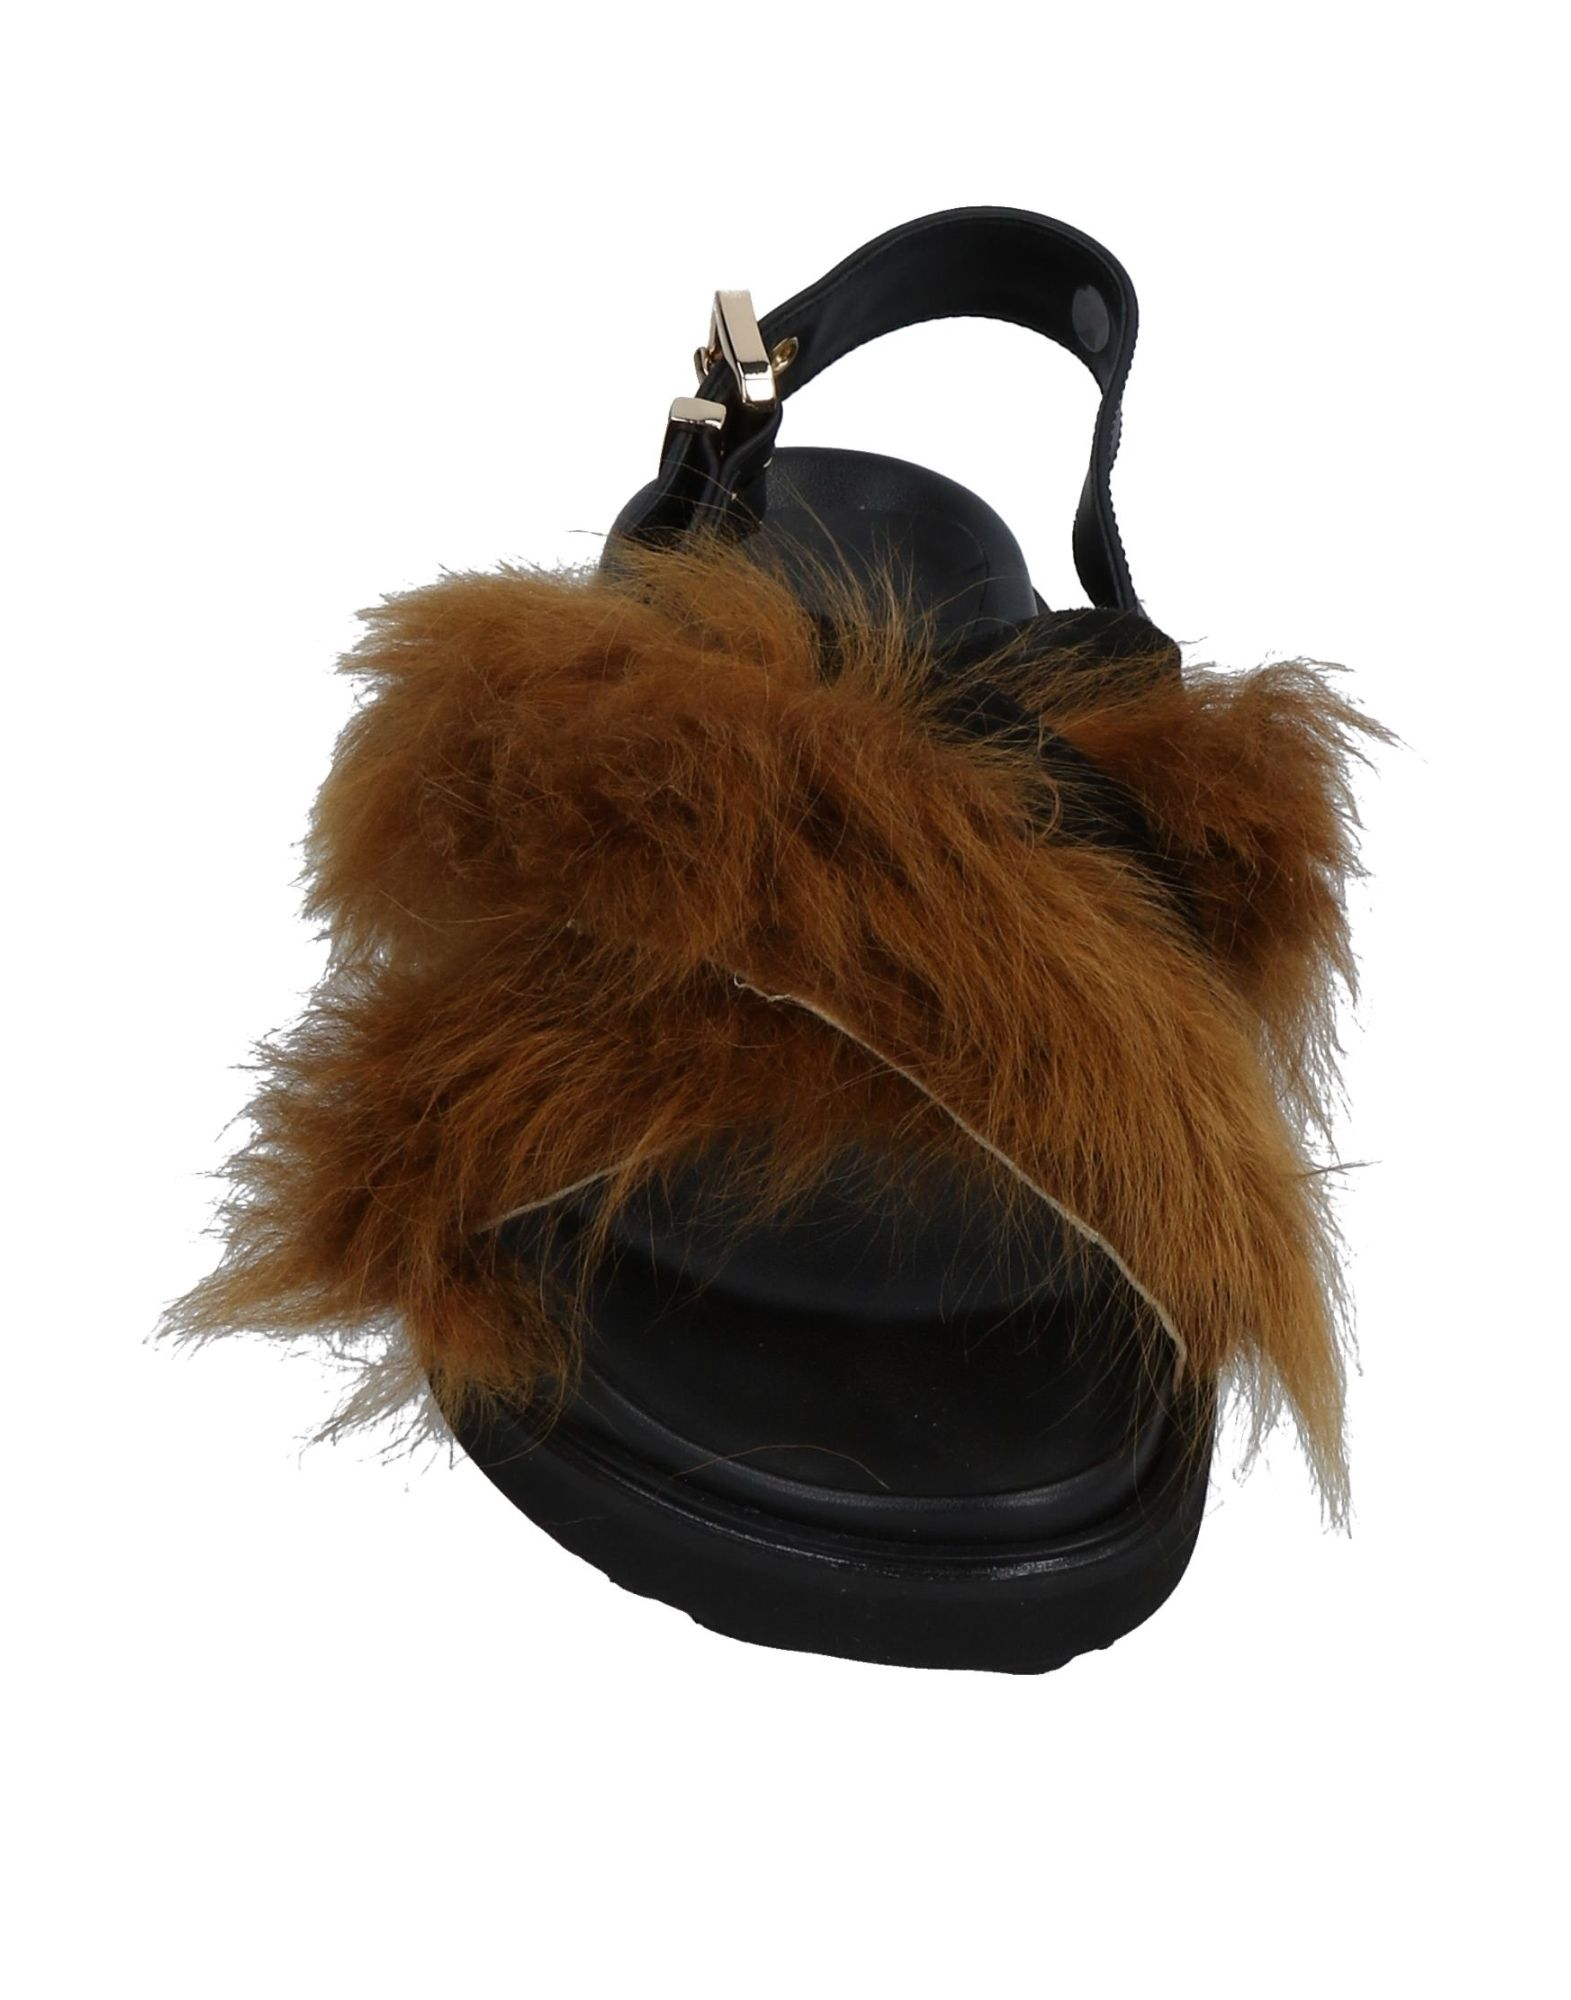 Emanuela Caruso Capri Sandalen Damen Damen Damen  11491632FF Gute Qualität beliebte Schuhe efe2ca